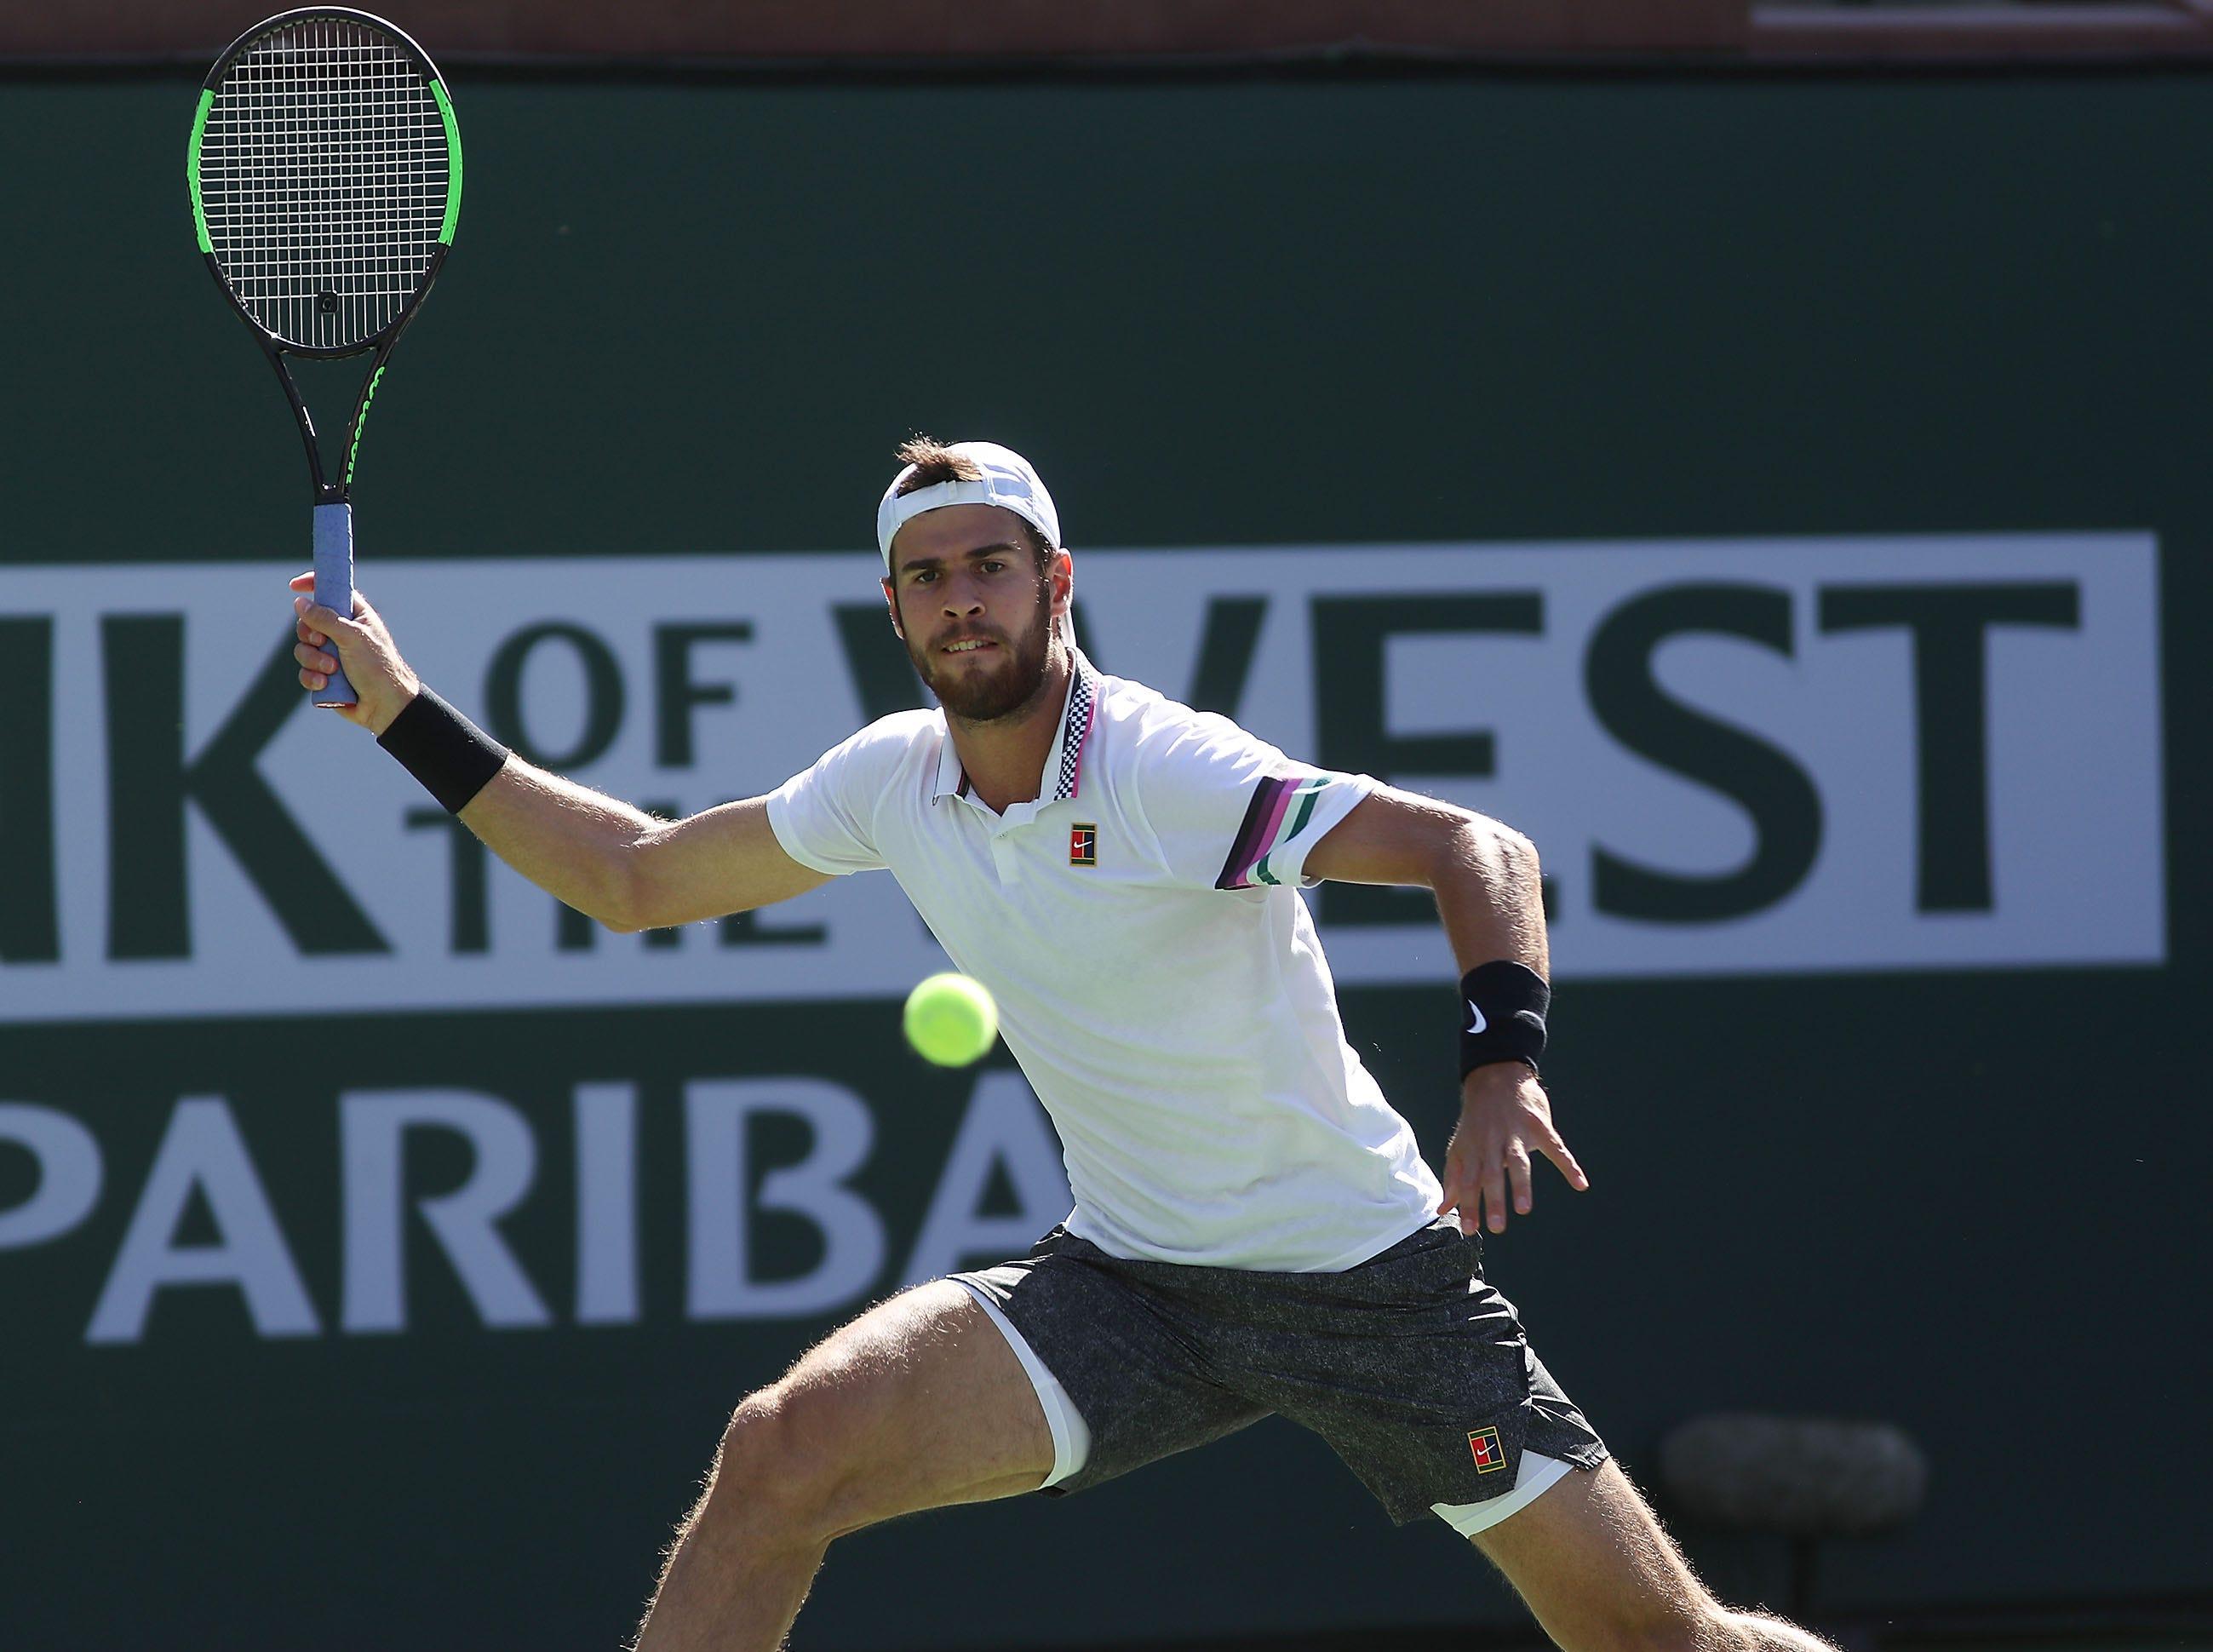 Karen Khachanov hits a shot during his win over John Isner at the BNP Paribas Open in Indian Wells, March 13, 2019.